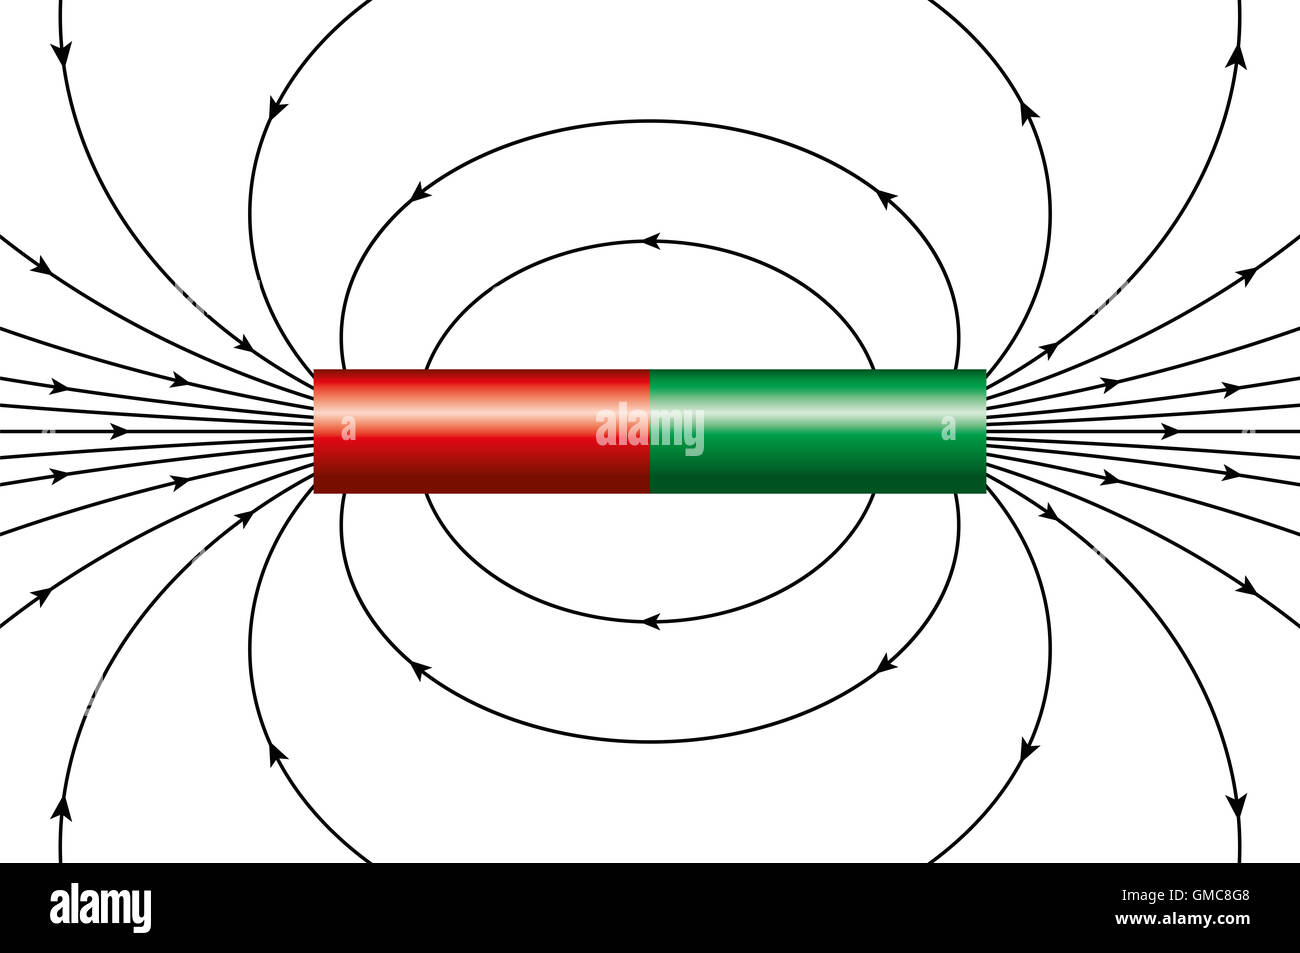 Magnetic Field Field Lines Stockfotos & Magnetic Field Field Lines ...